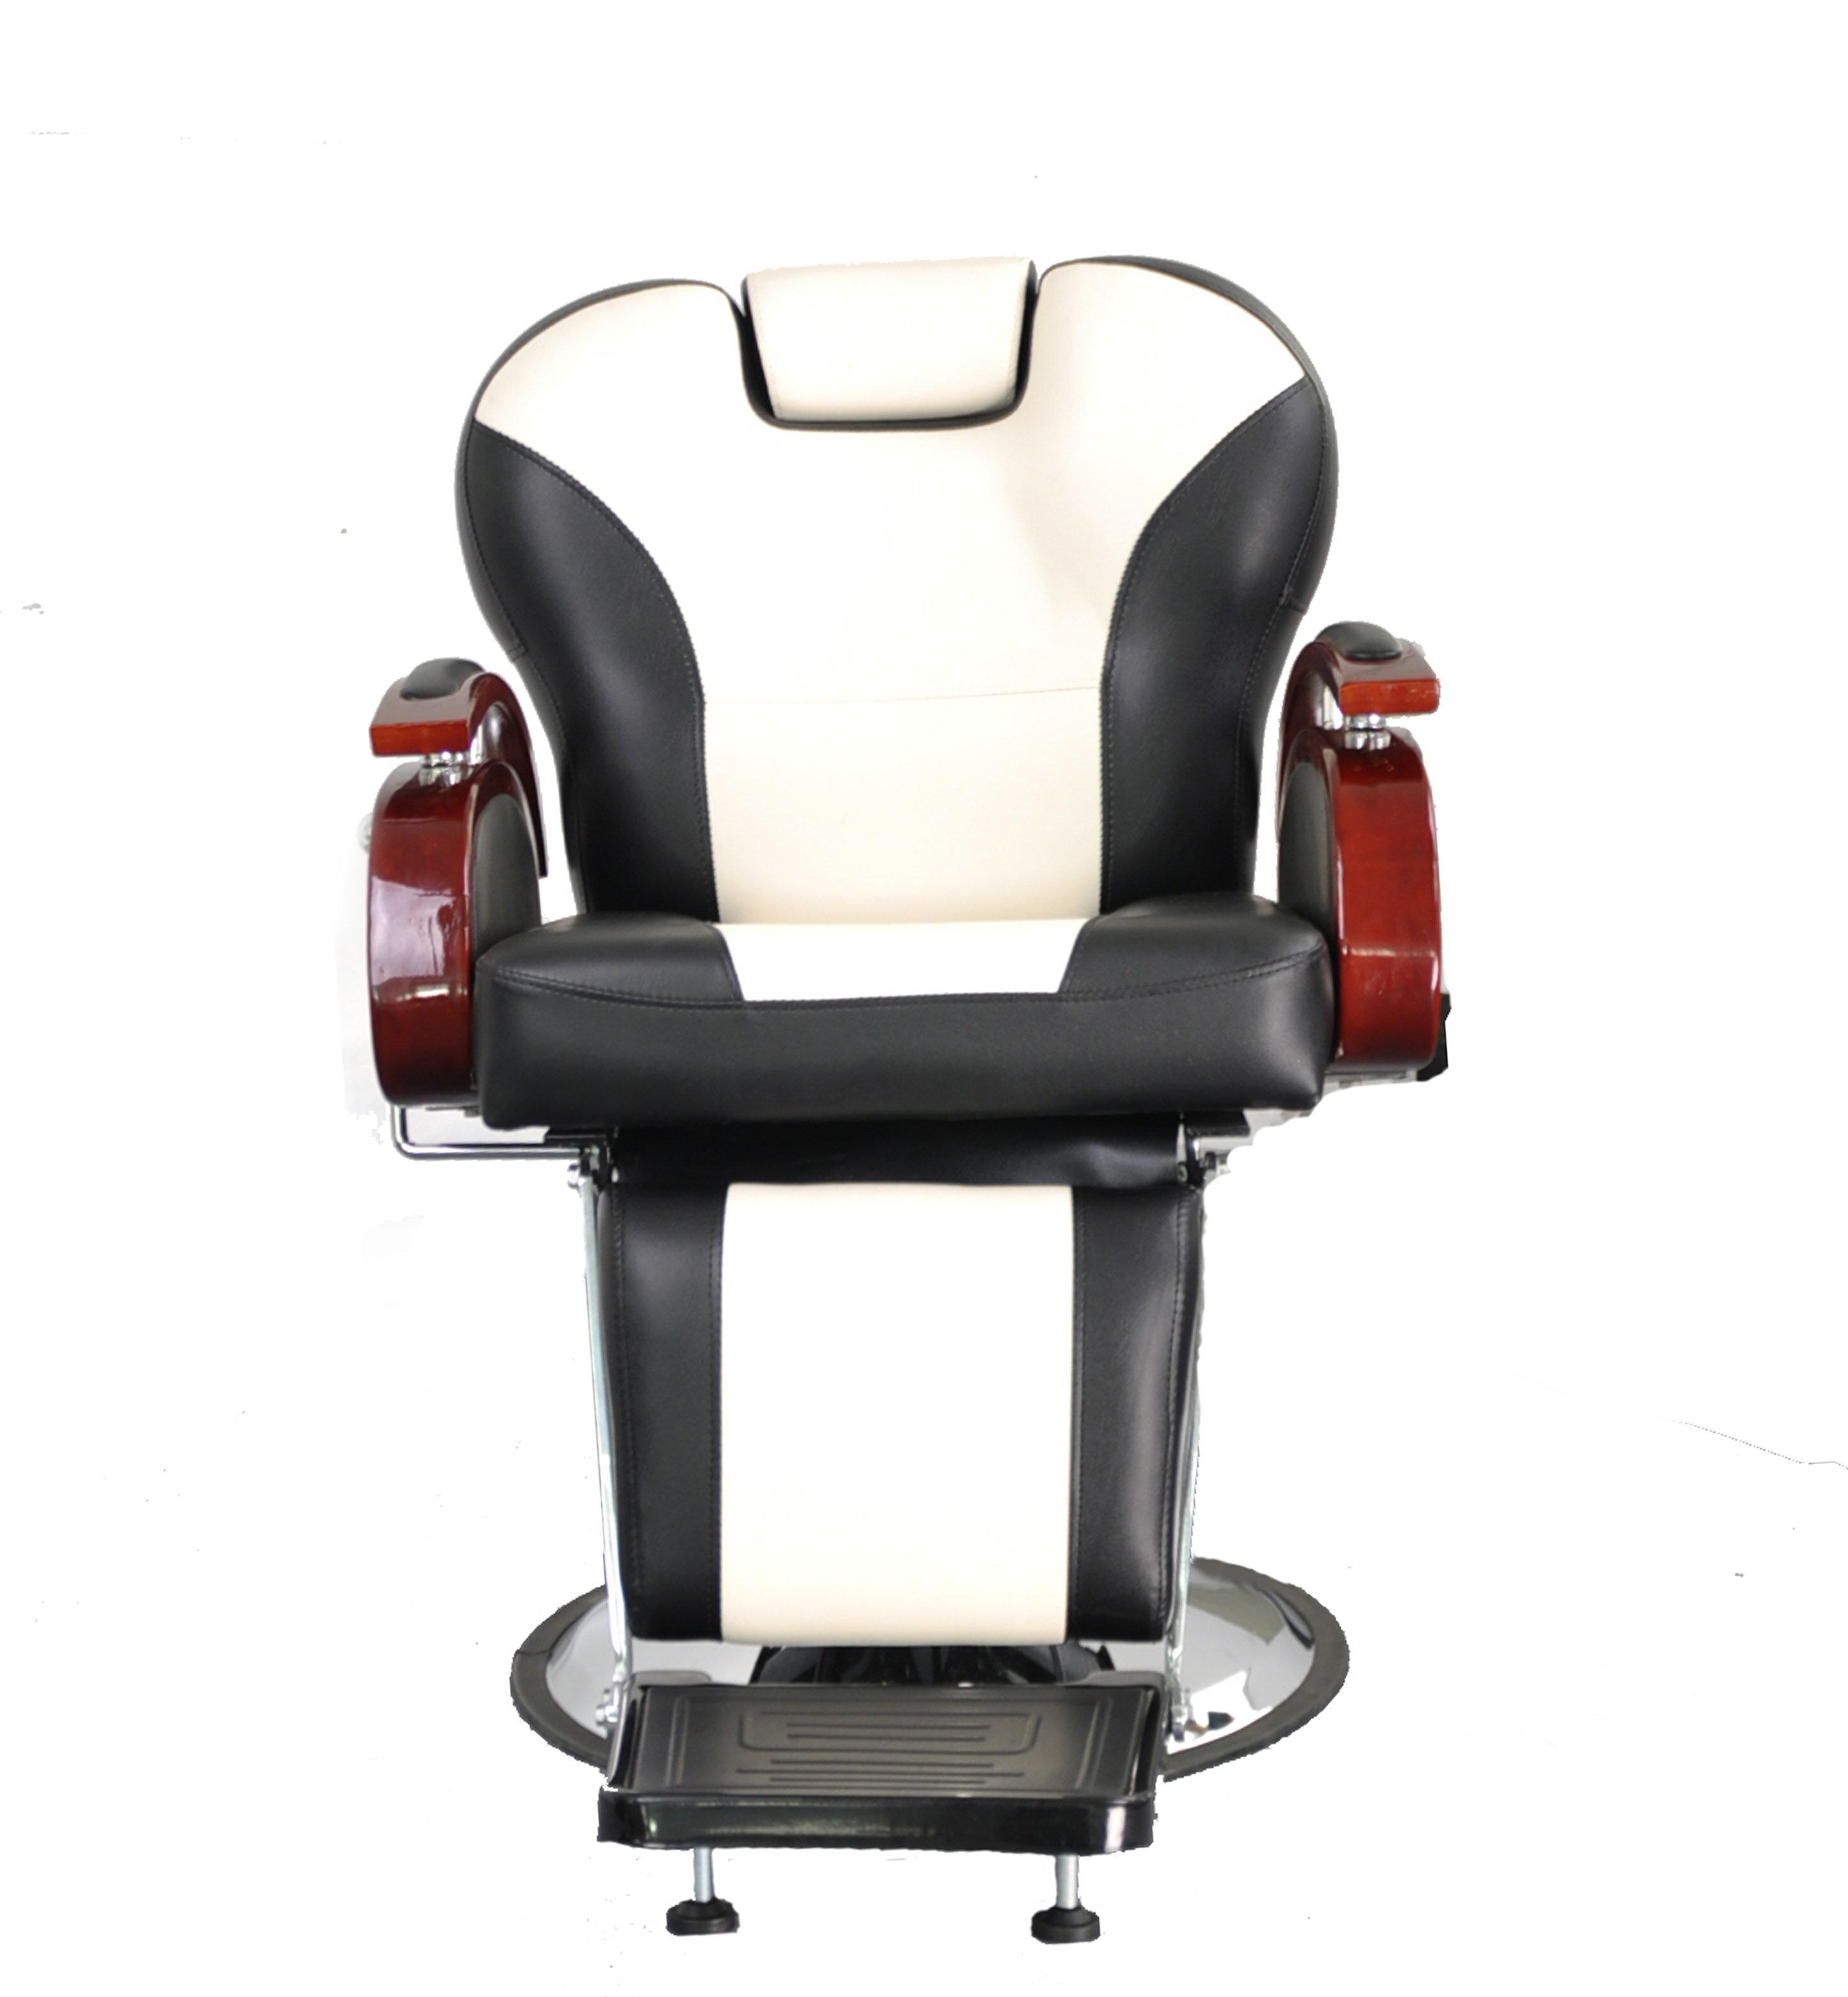 BarberPub All Purpose Hydraulic Recline Barber Chair Salon Beauty Spa Shampoo Equipment 8705 3